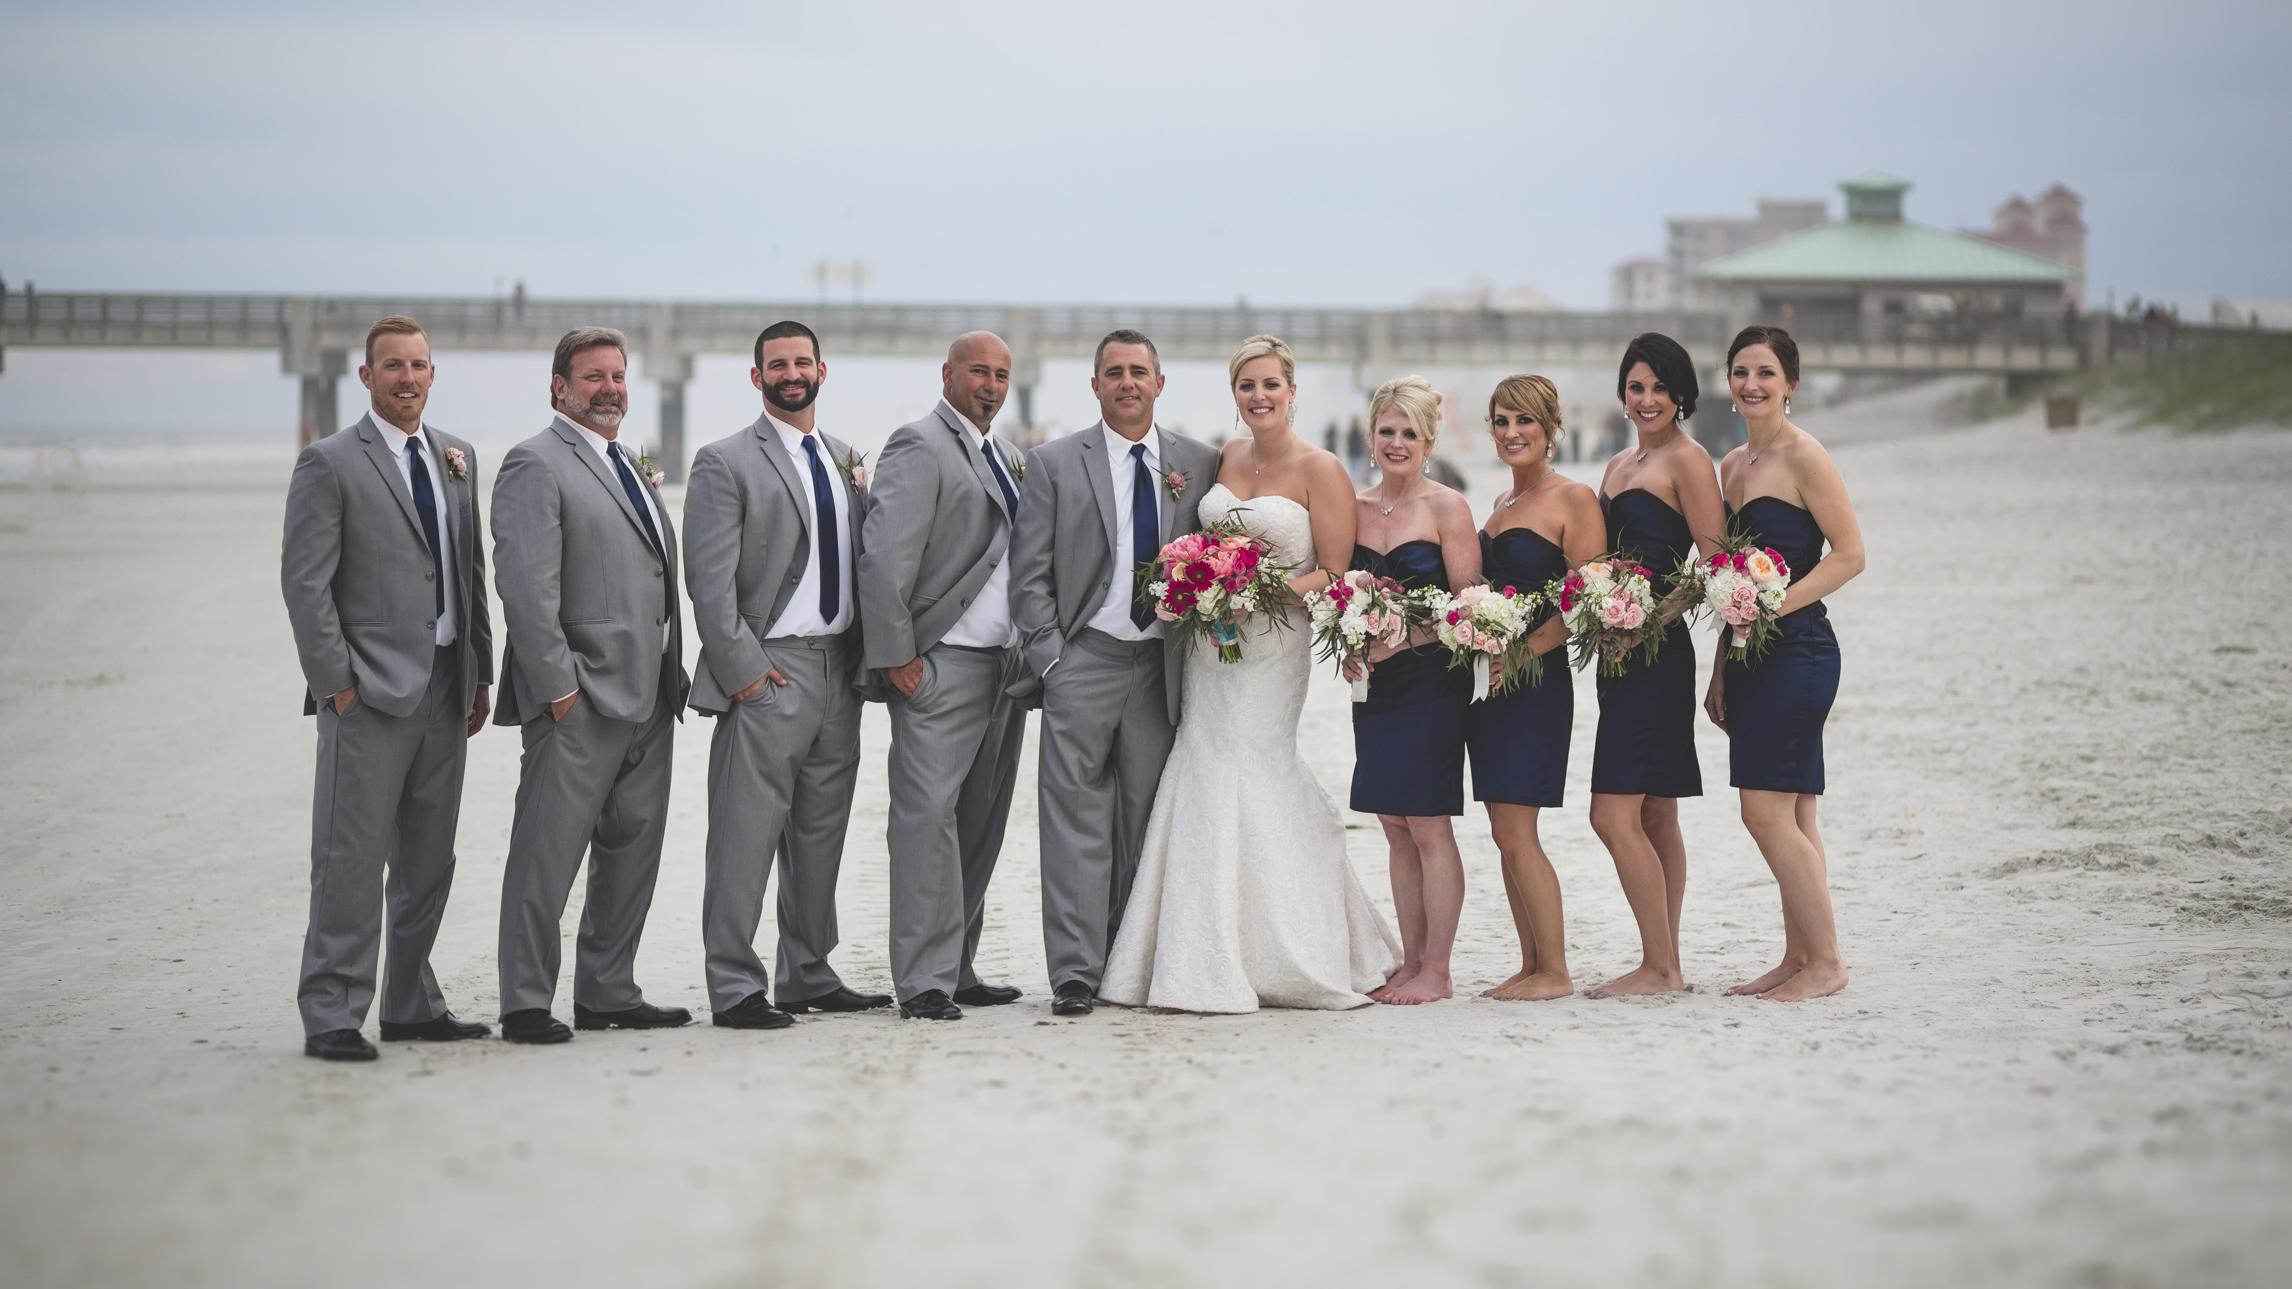 adam-szarmack-casa-marina-wedding-photographer-jacksonville-beach-florida-37.jpg